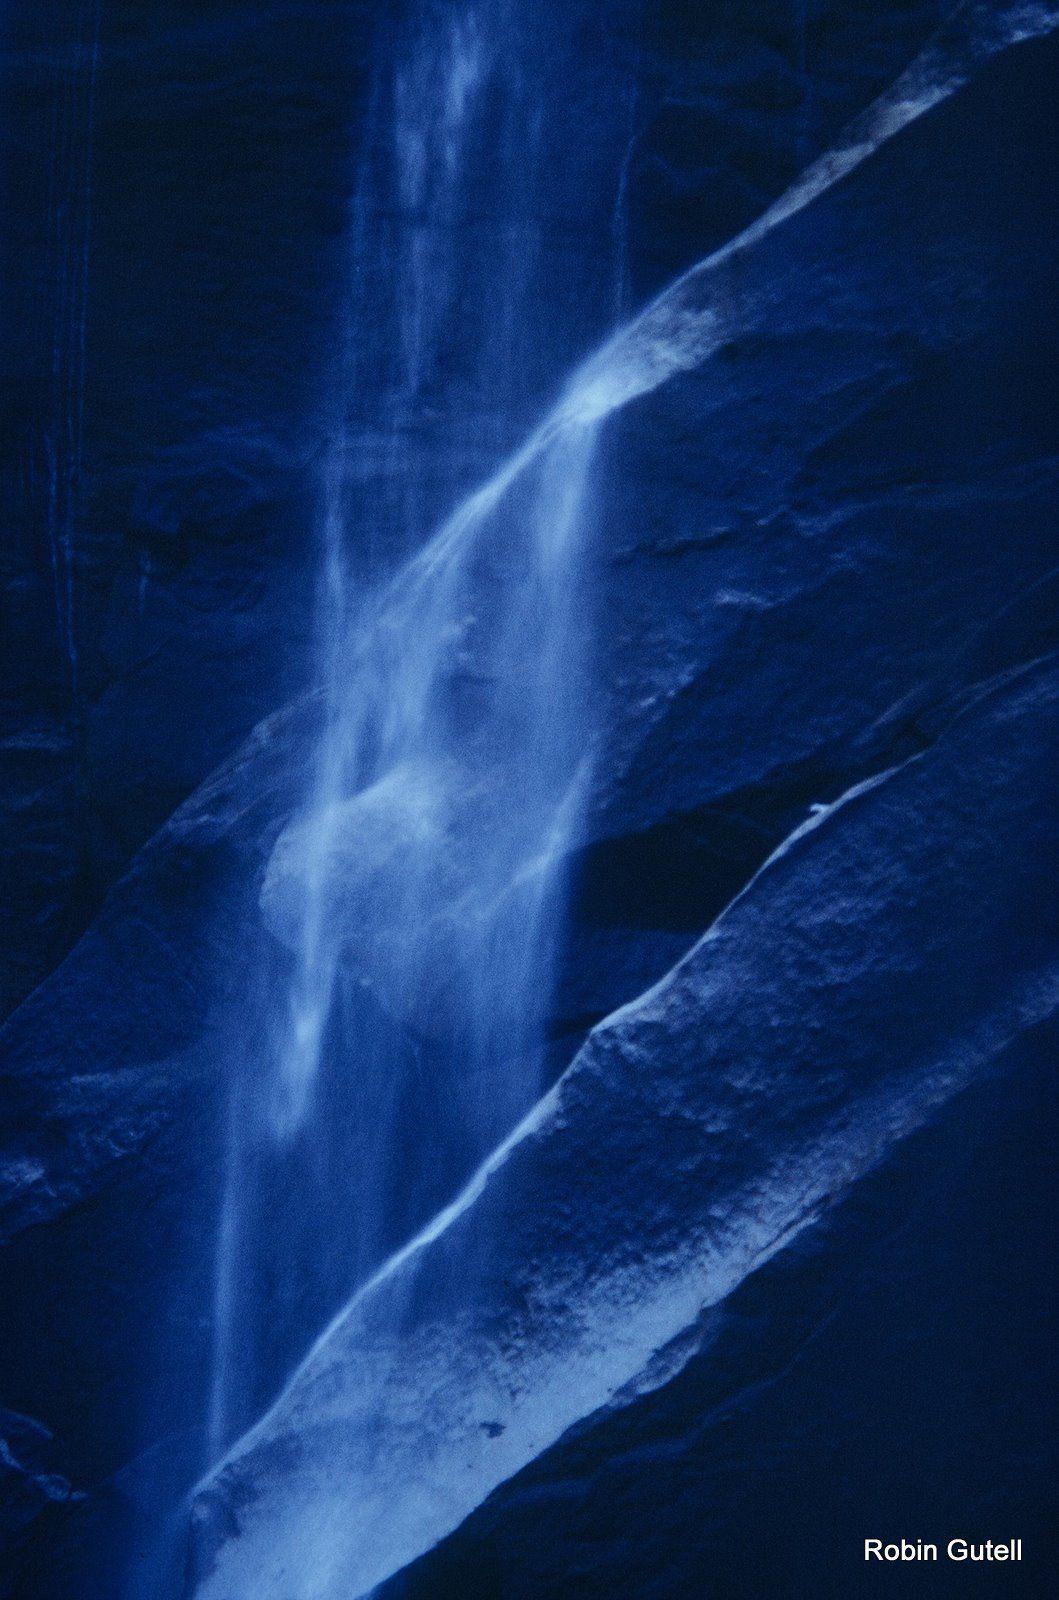 Waterfall, Yosemite ~1980